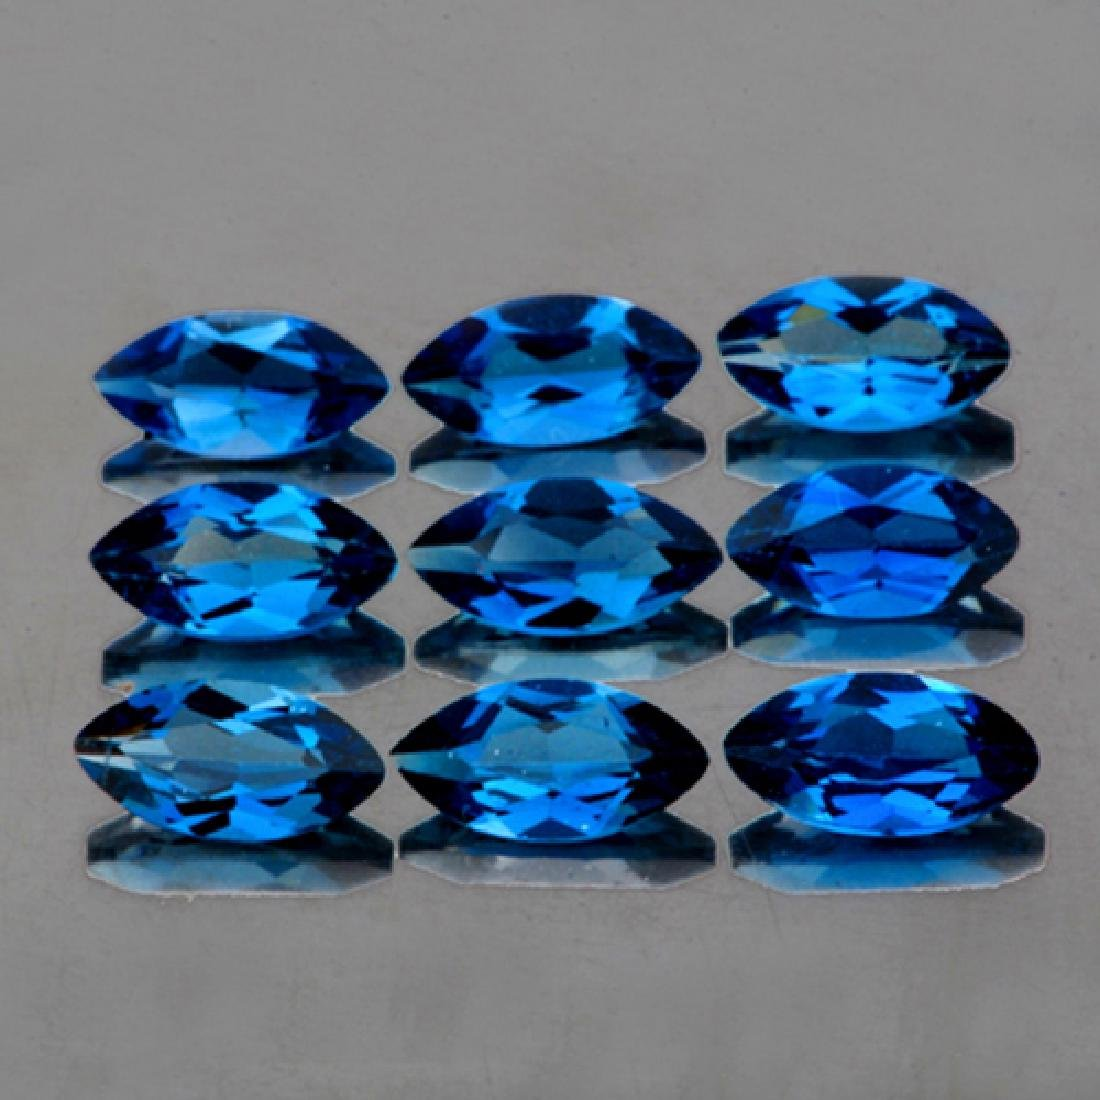 Natural London Blue Topaz (6 Pcs) 8x4 MM - FL